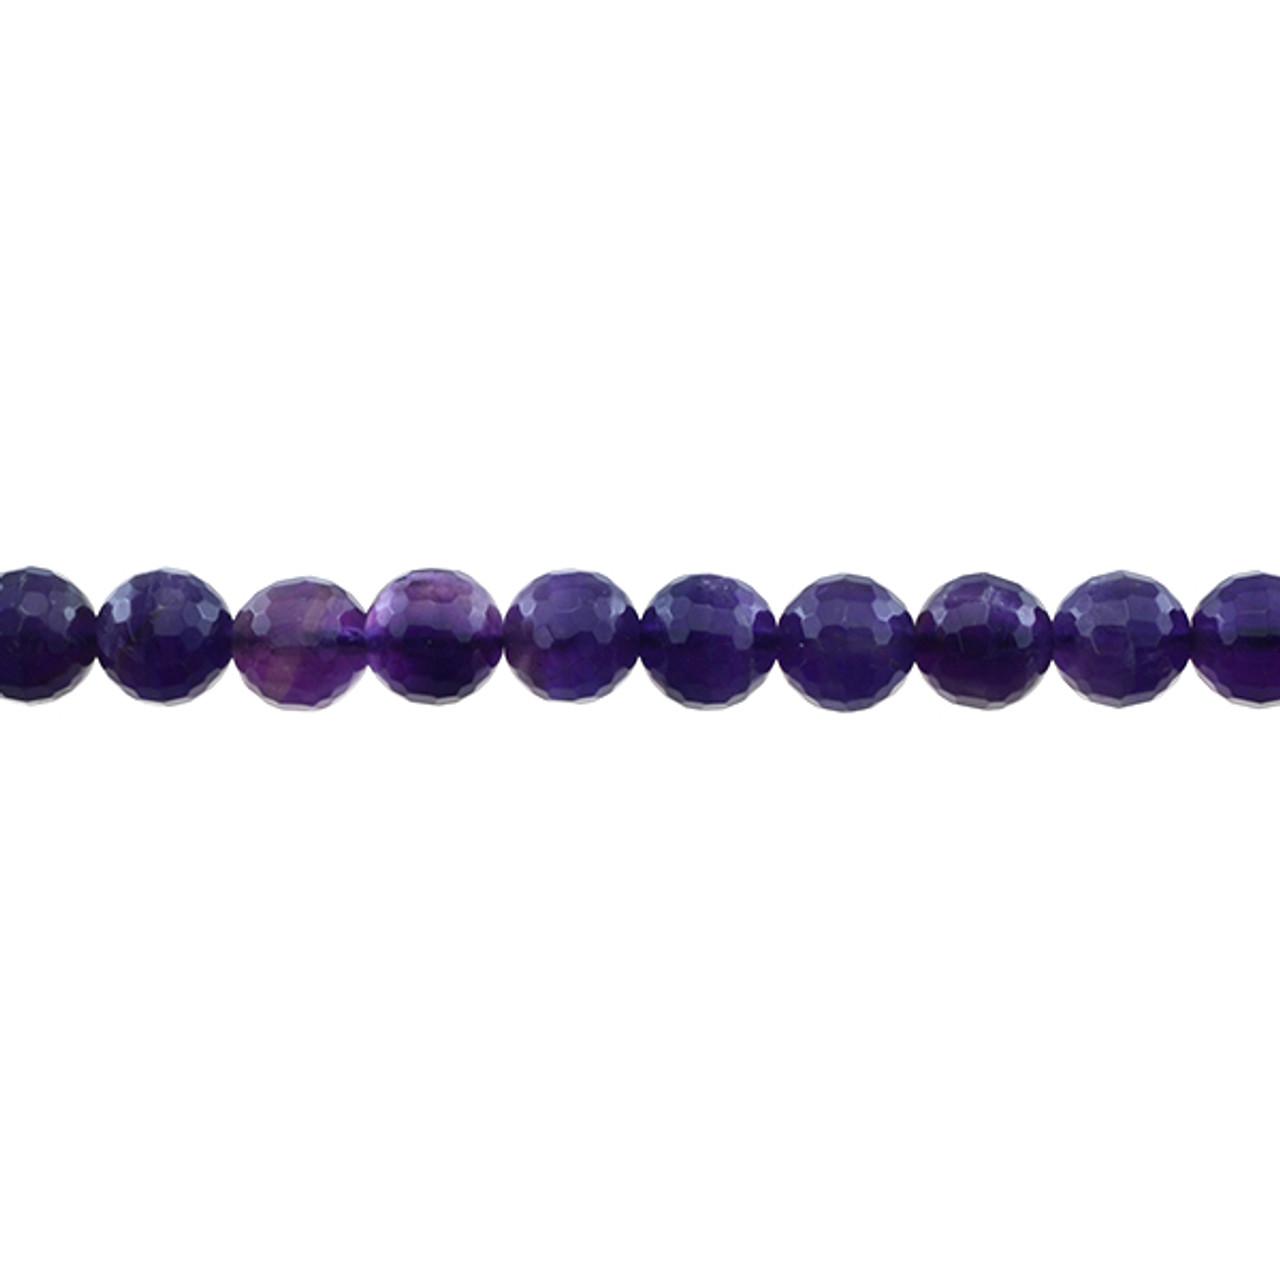 Natural Genuine Dark Purple Amethyst Hand Cut Loose Gemstone Faceted Rondelle Beads  16